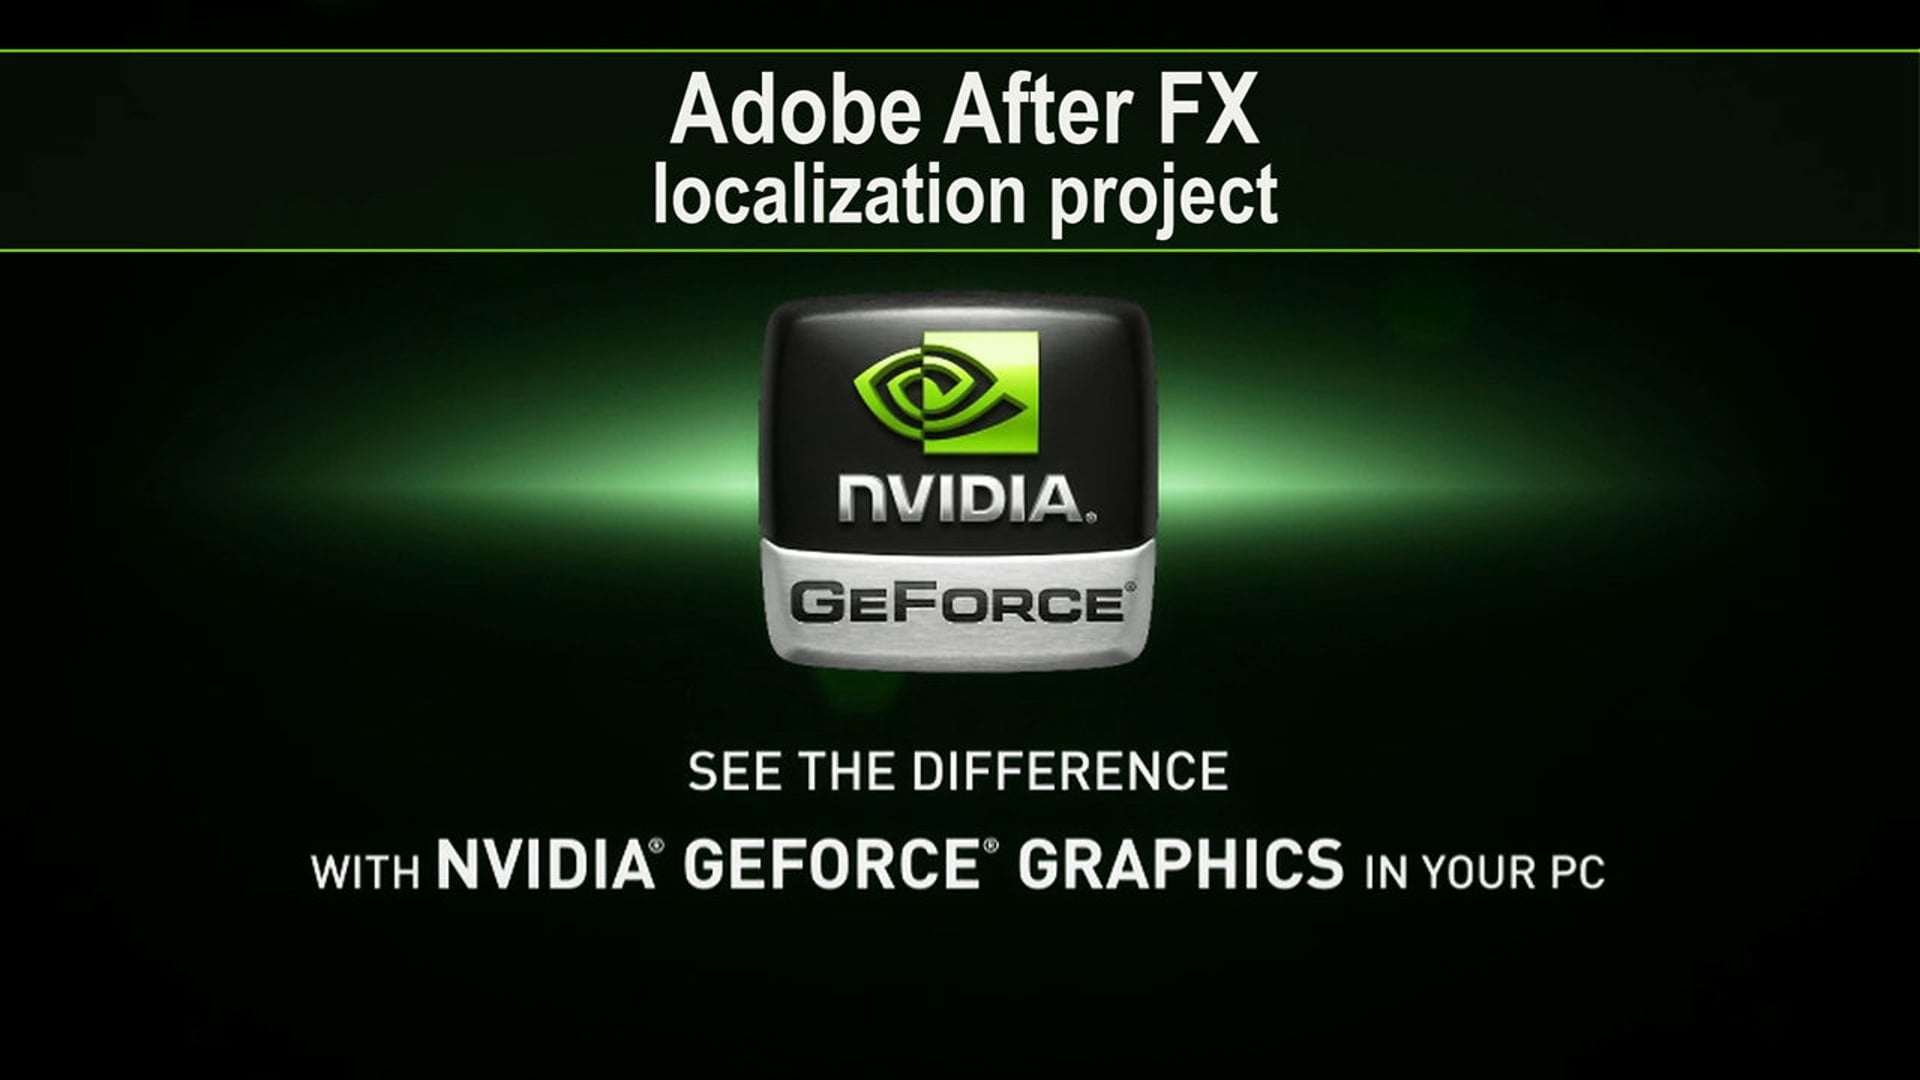 Nvidia GeForce Graphics